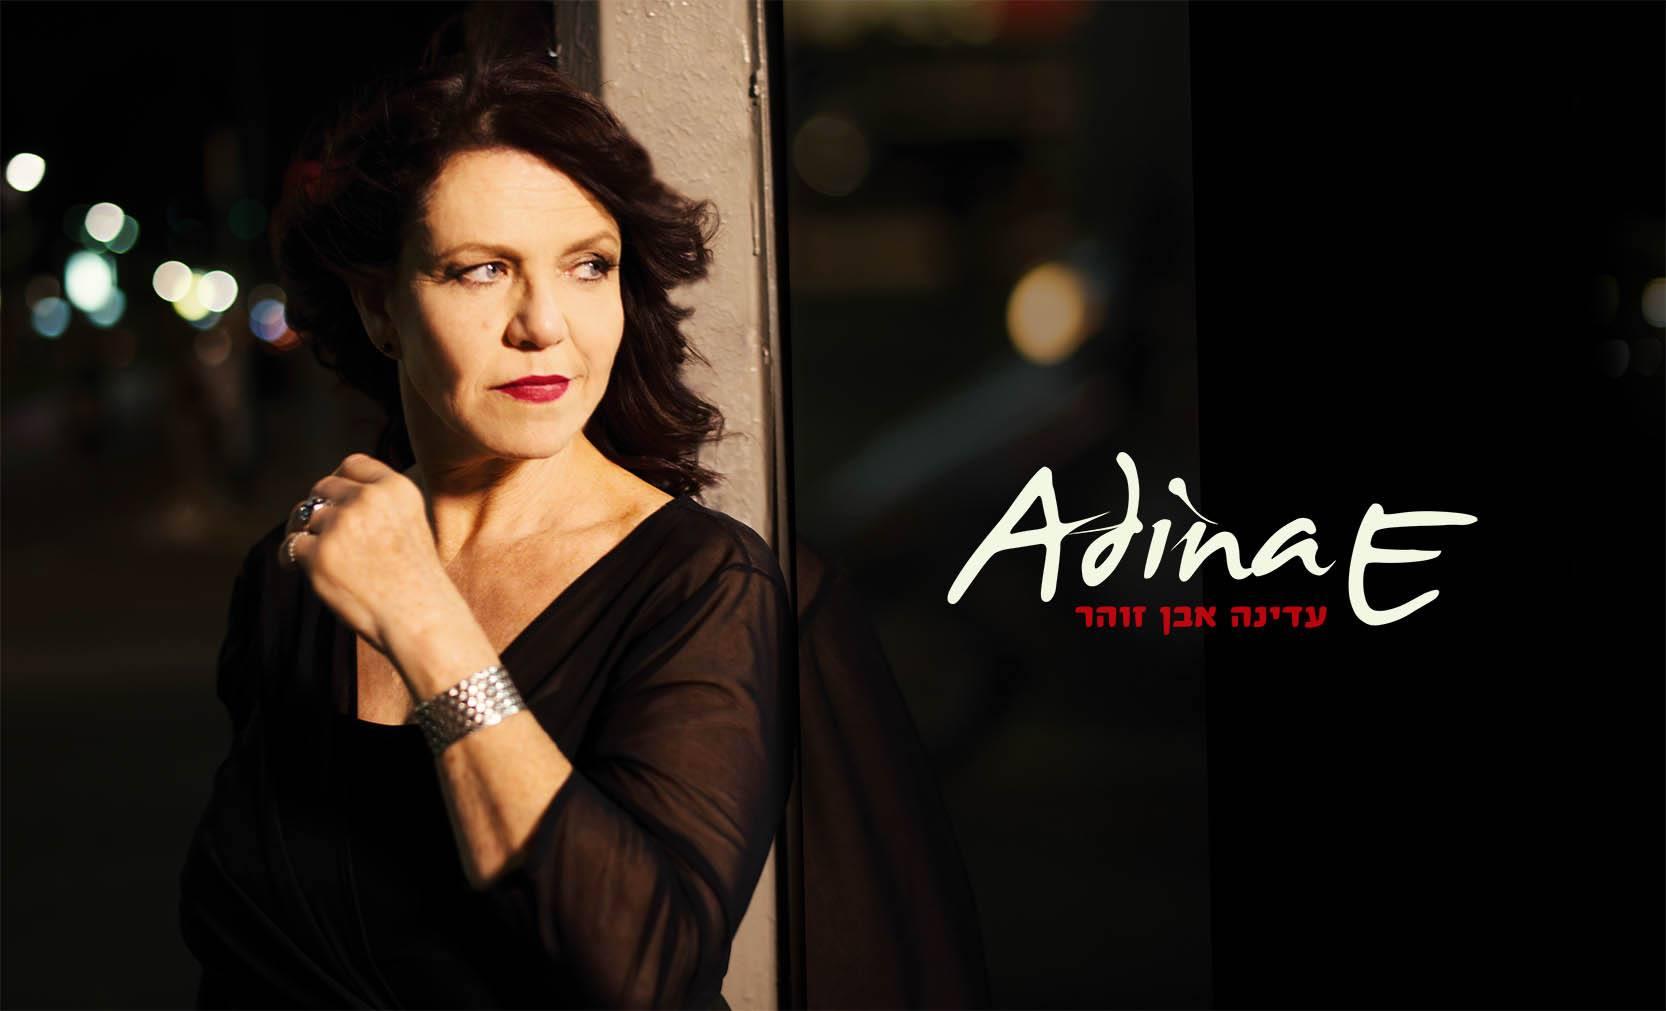 Adina E, Adina E Interview